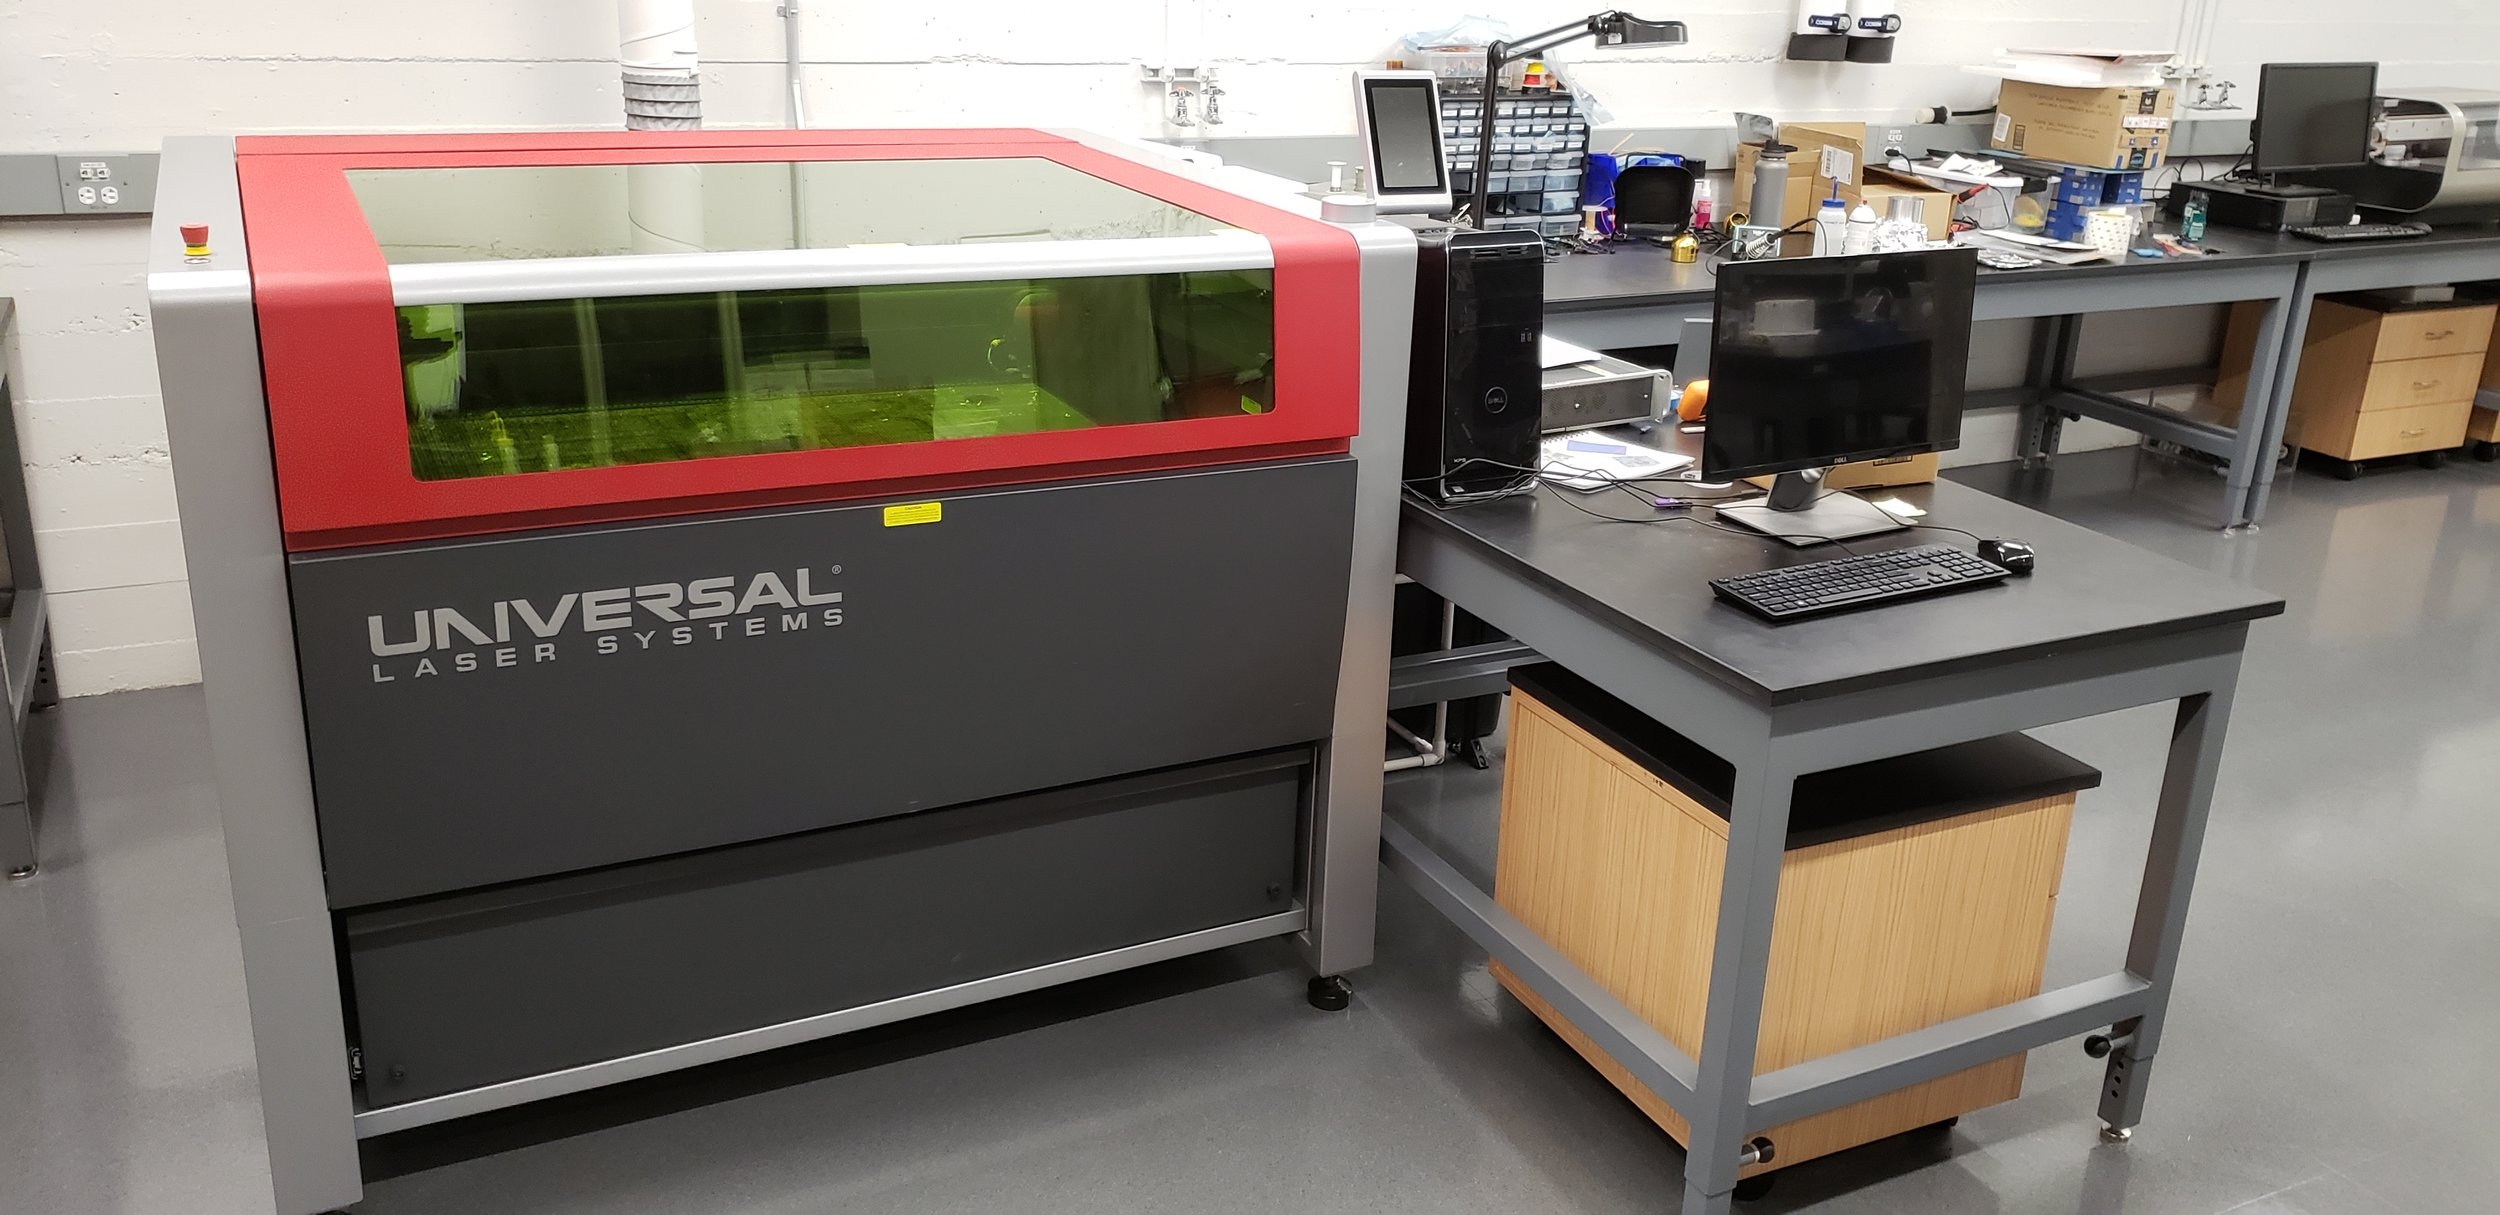 Universal Laser Systems (002).jpg